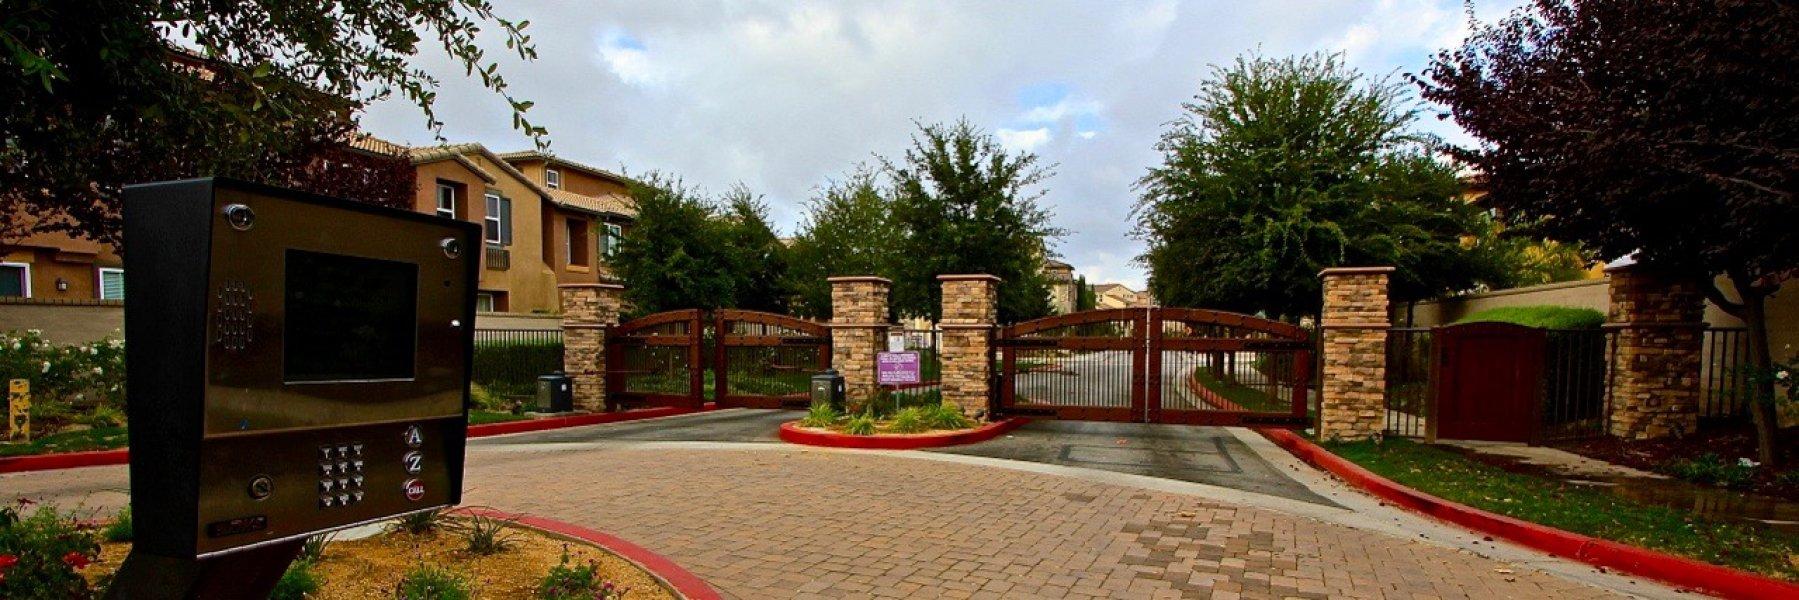 Temecula Lane is a community of homes in Temecula California